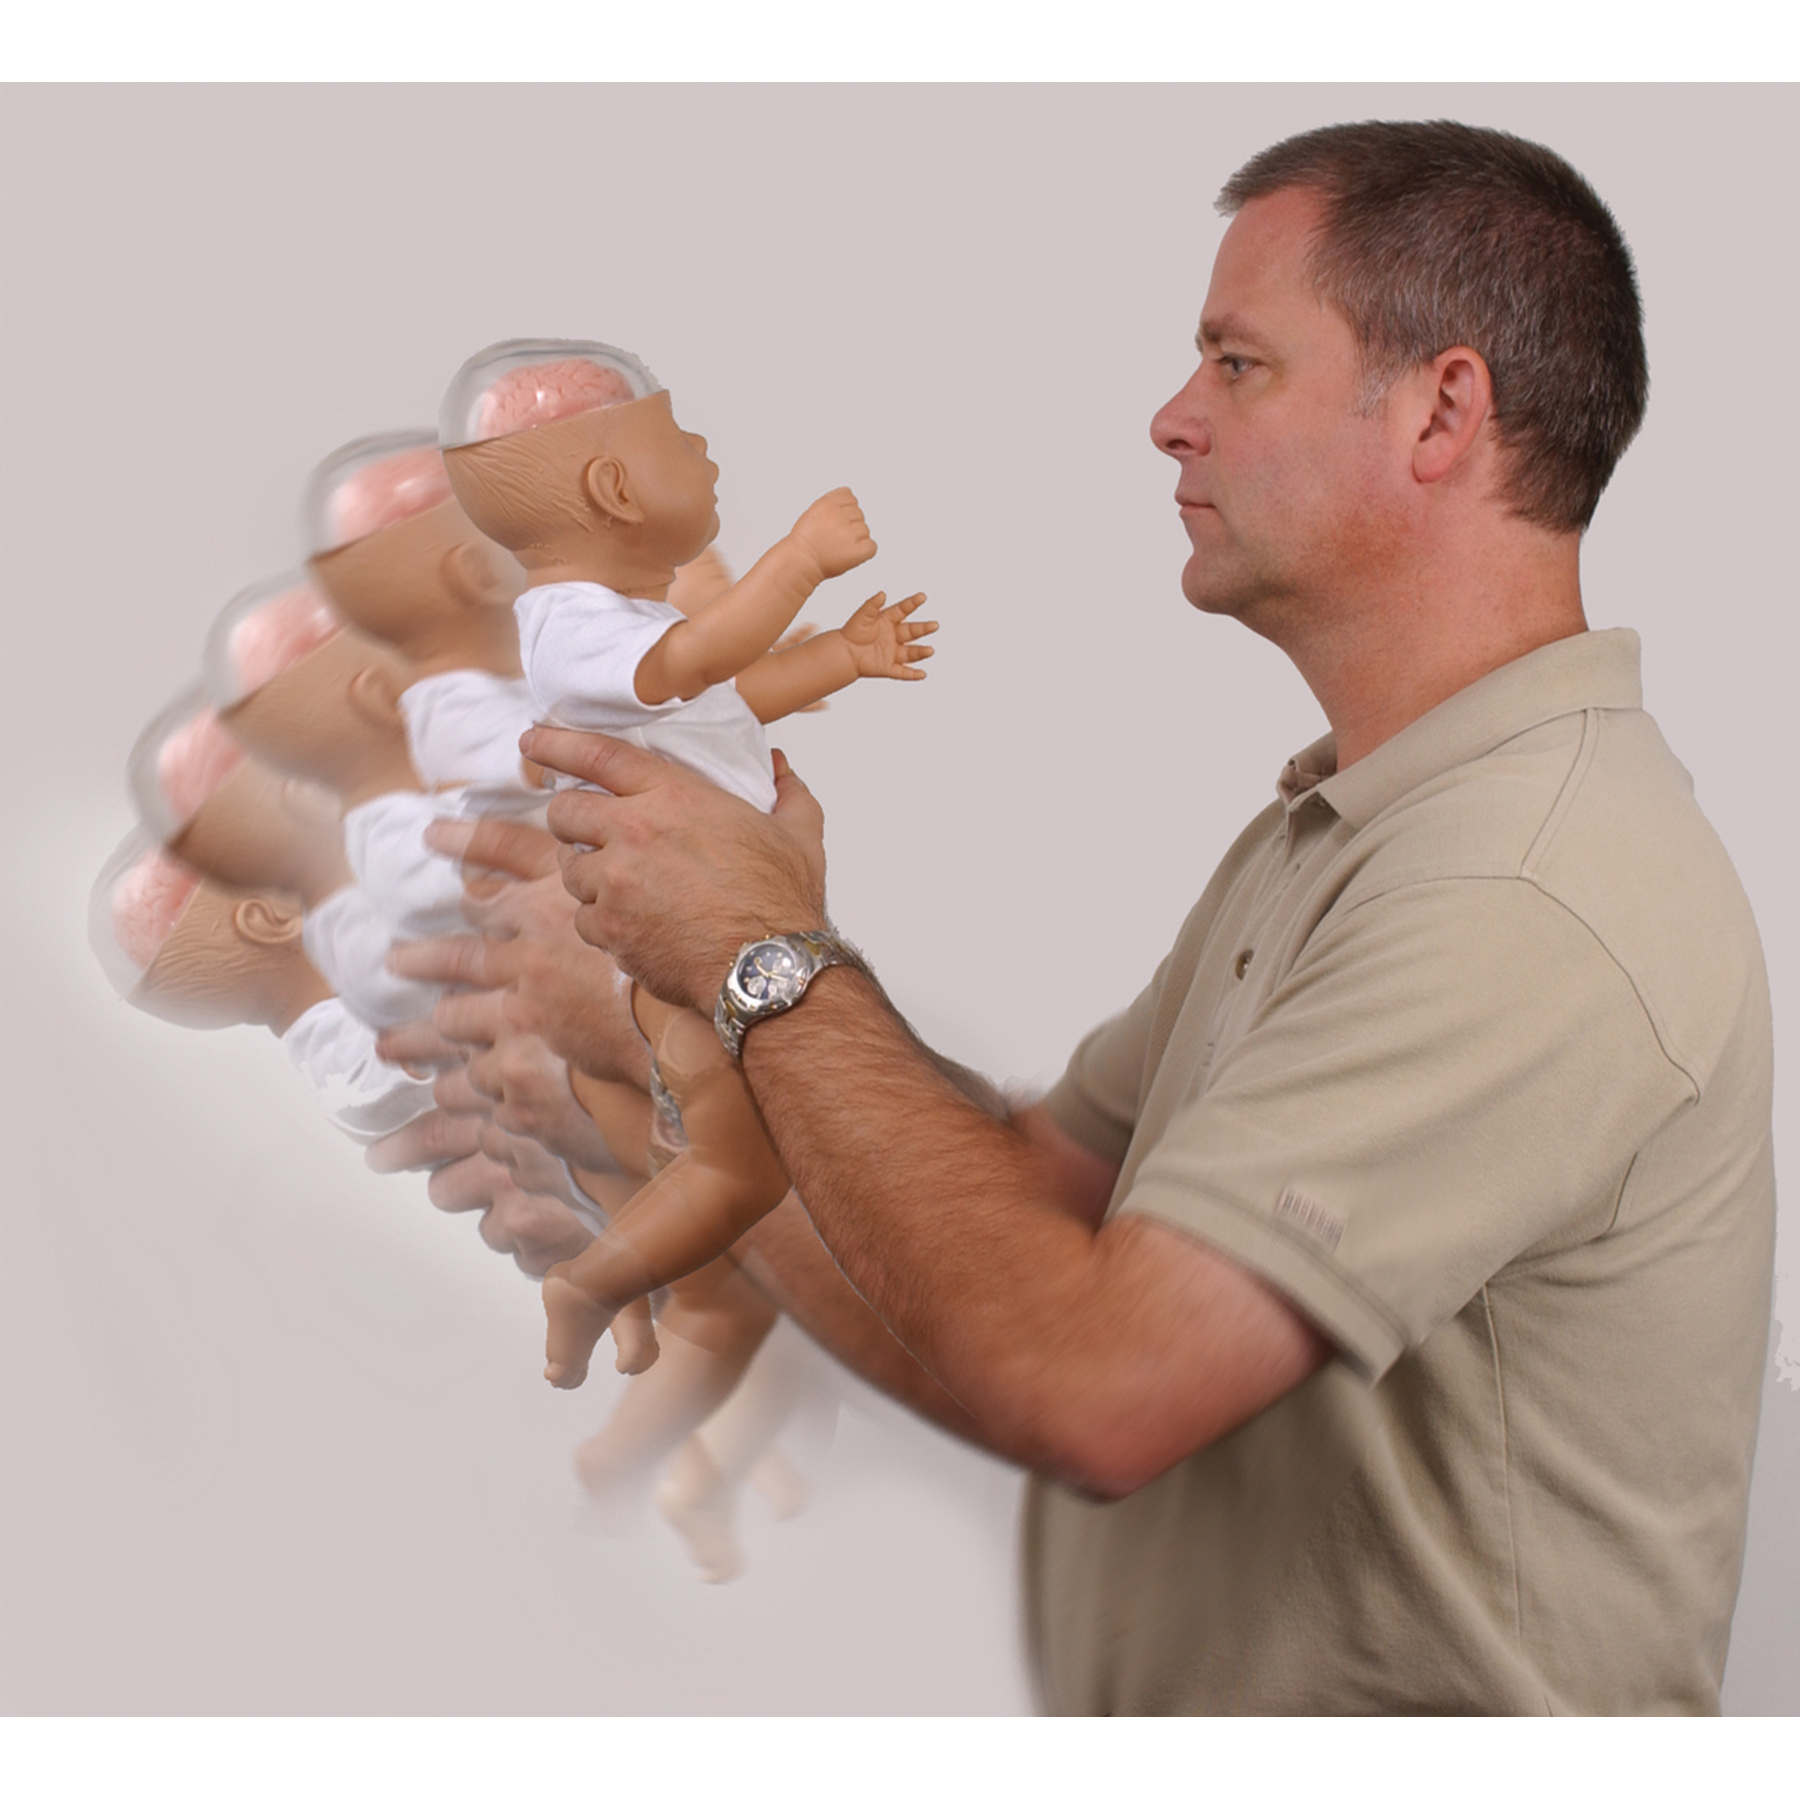 Shaken Baby Demonstration Model, man shaking doll wearing onesie with clear plastic head & pink brain inside, Health Edco, 53501